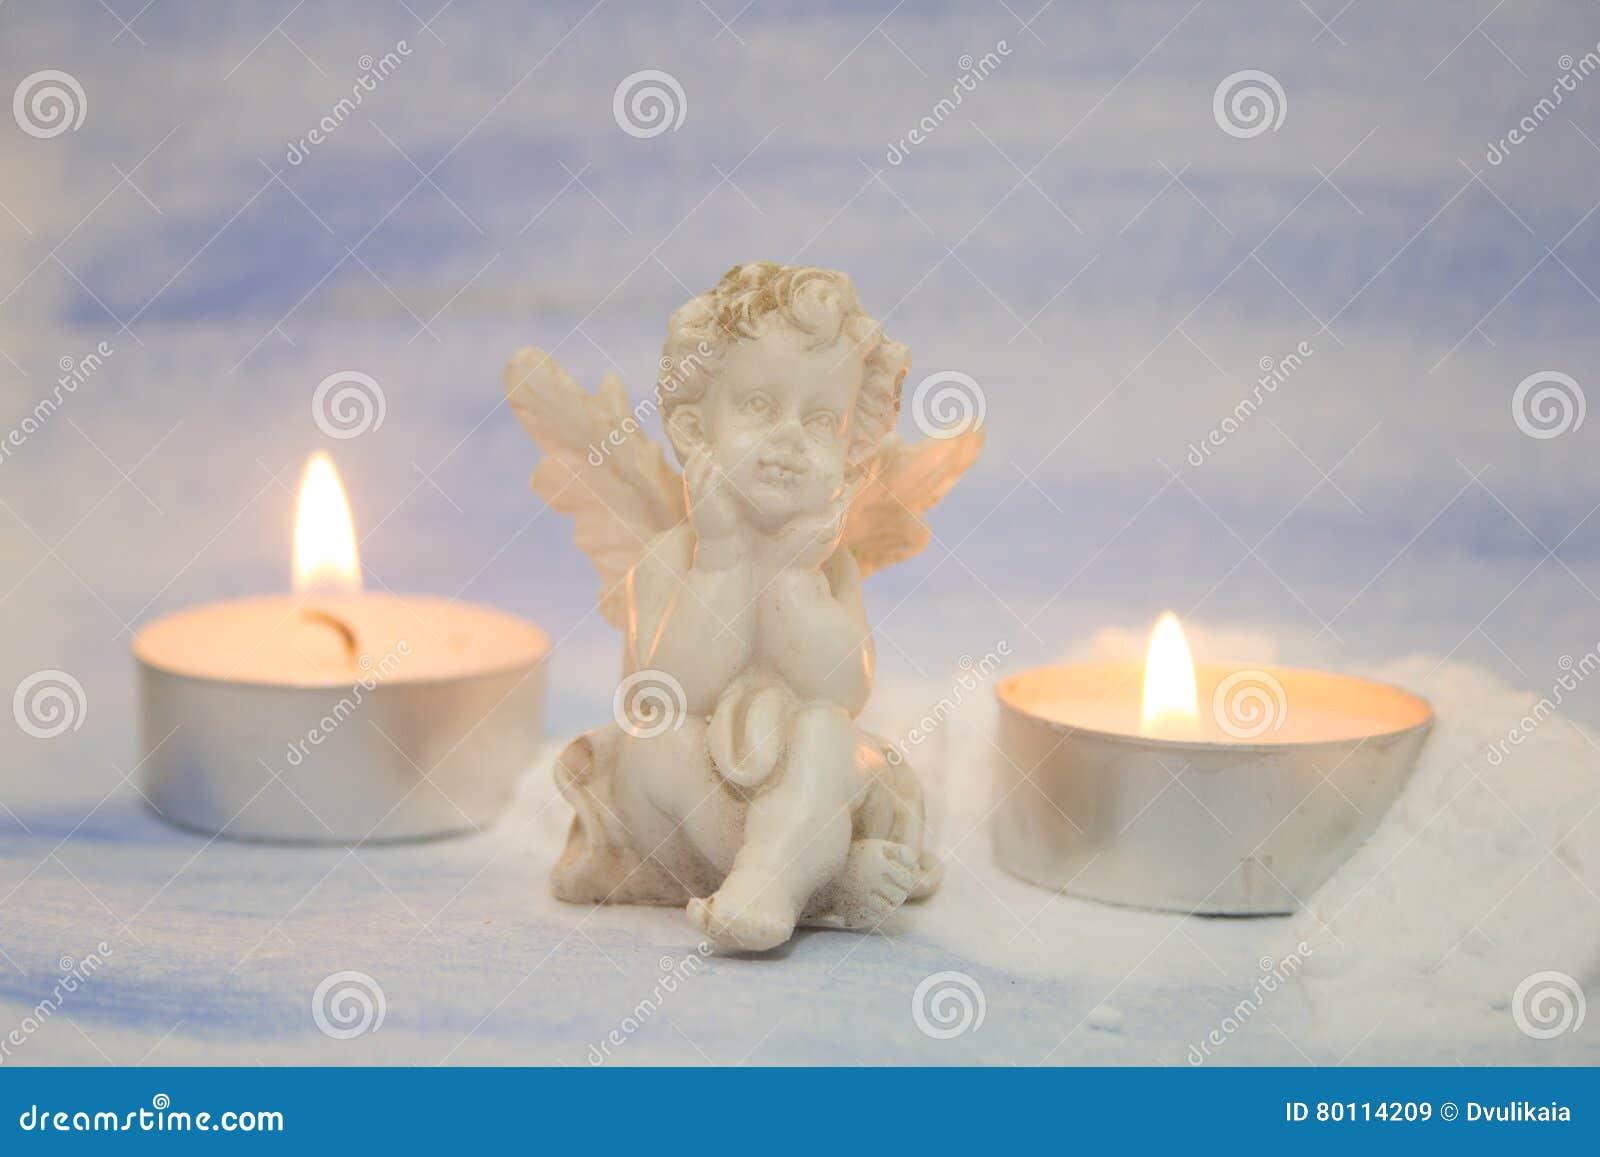 Decorare Candele Bianche : Figurina e candele bianche di angelo immagine stock immagine di